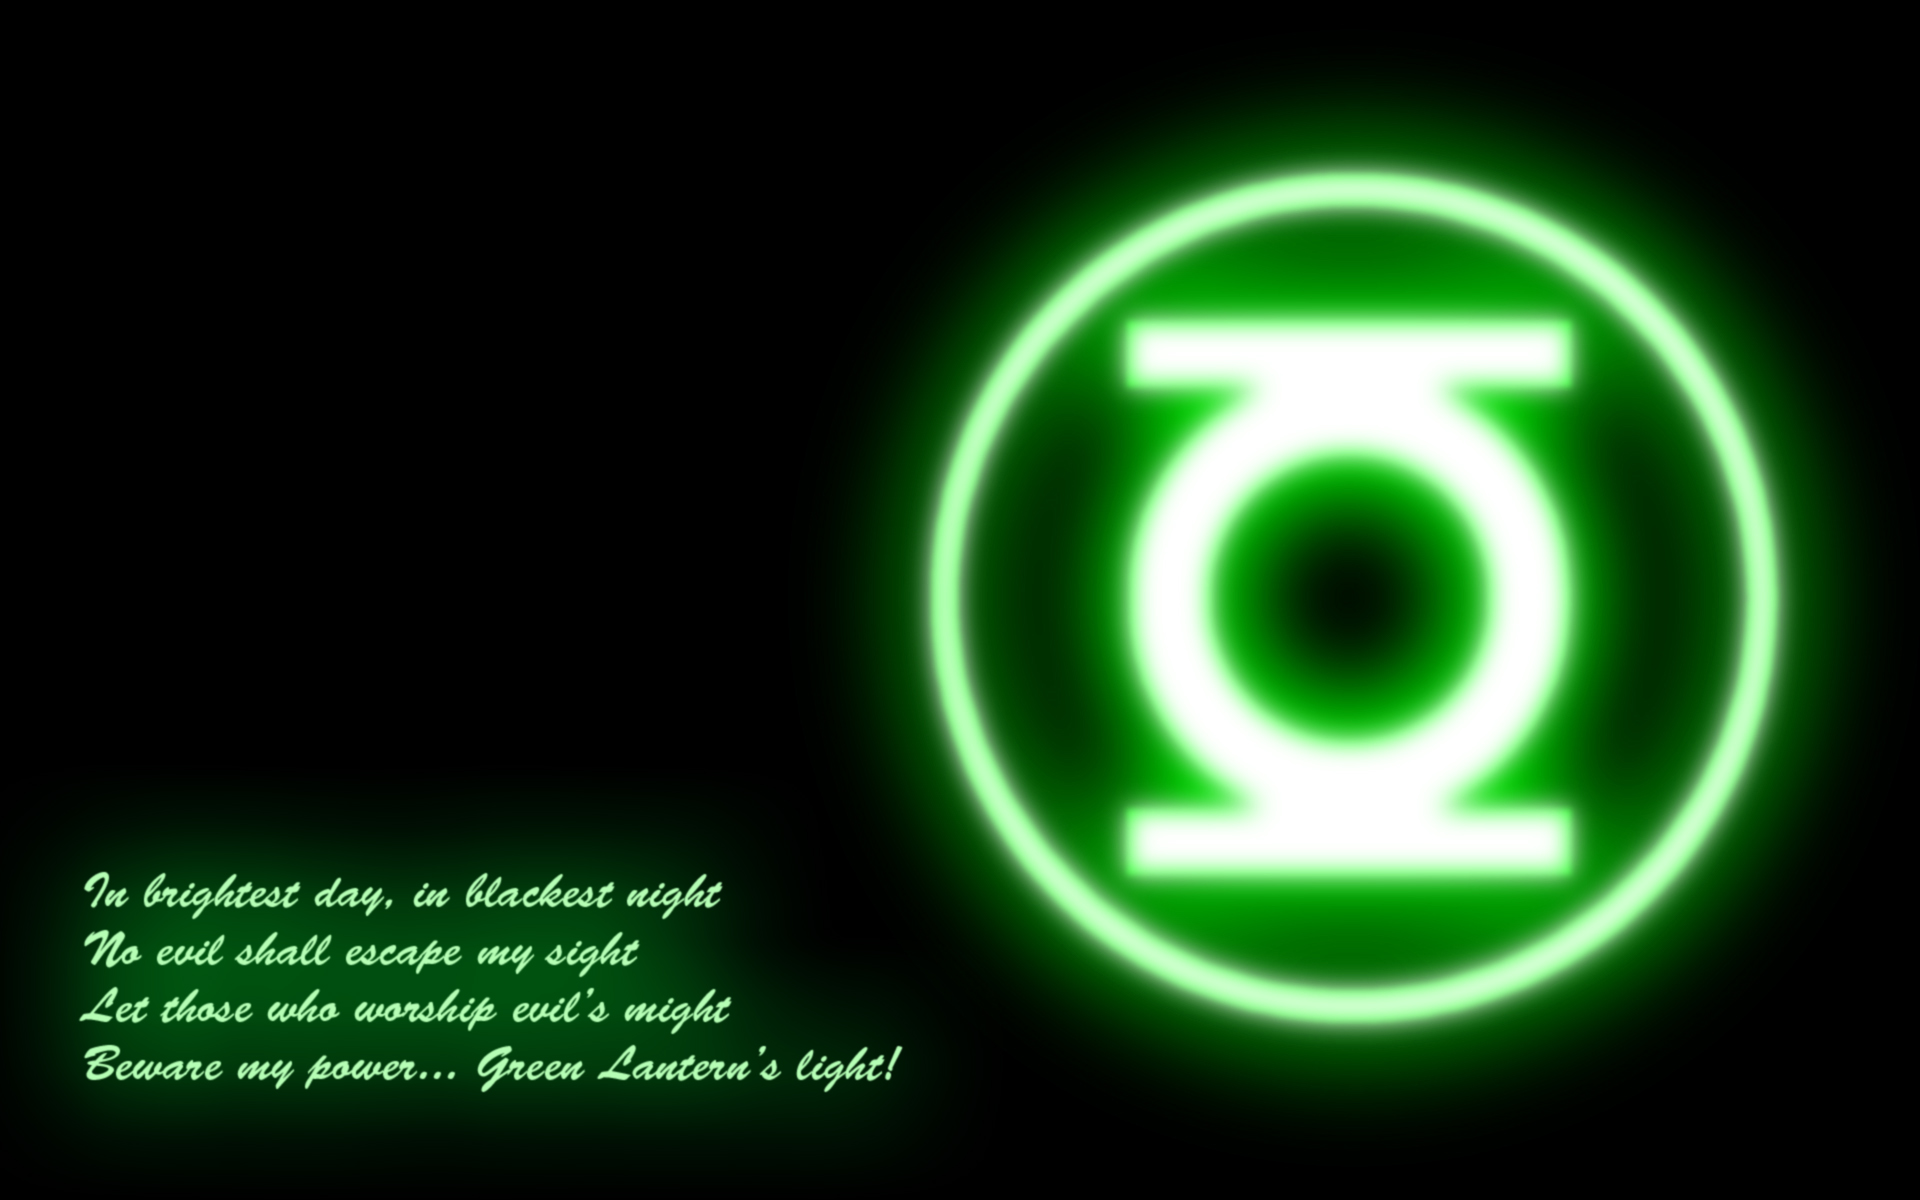 Green Lantern Computer Wallpapers Desktop Backgrounds 1920x1200 1920x1200